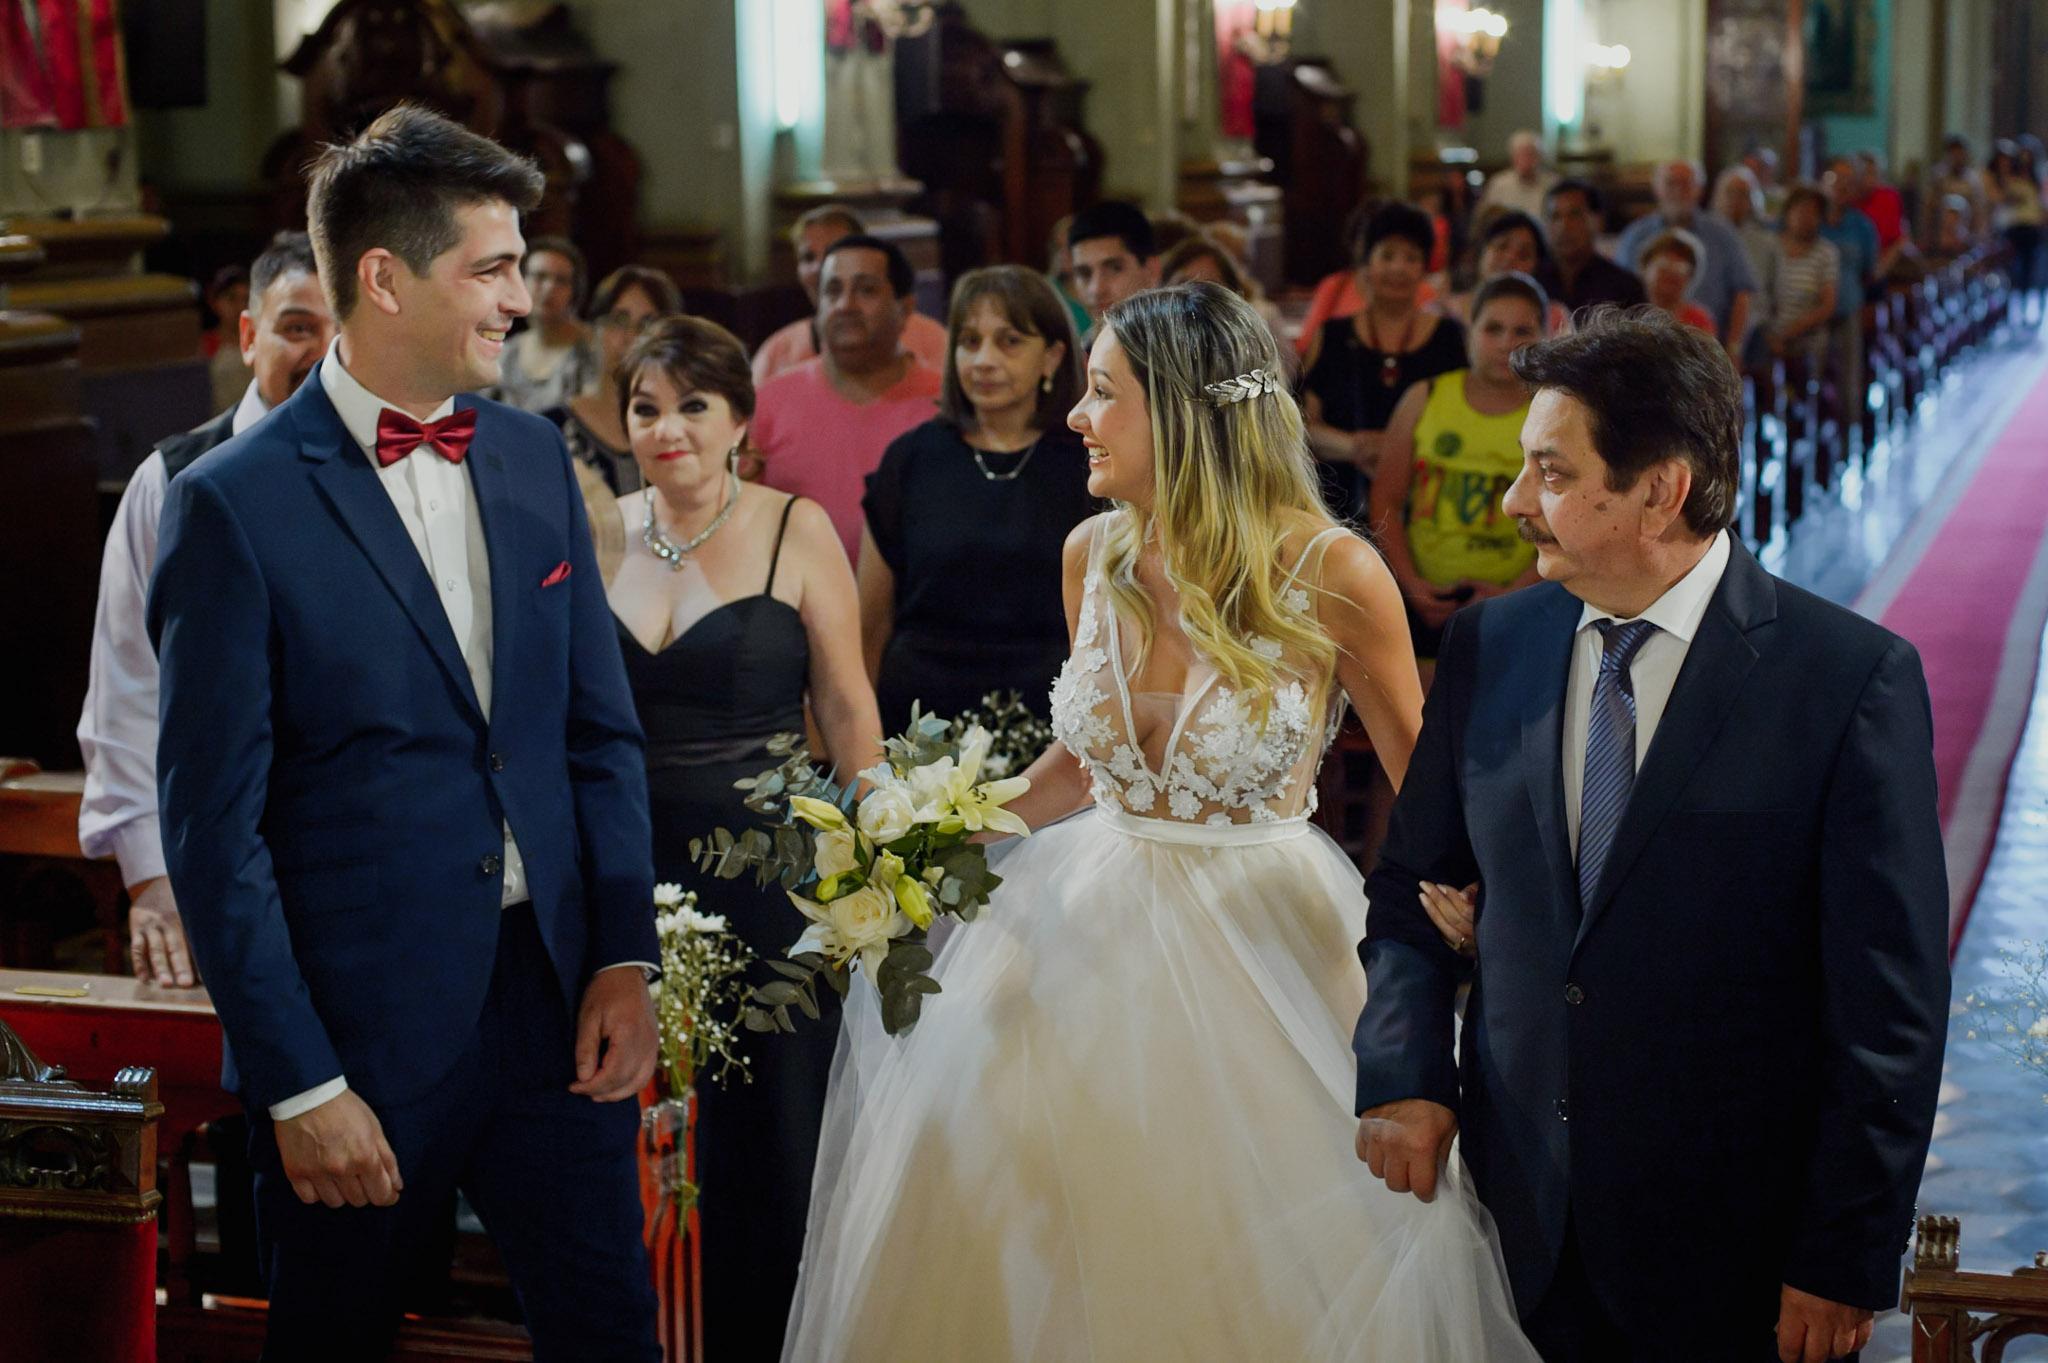 boda en catamarca Agus & Peche - phmatiasfernandez.com